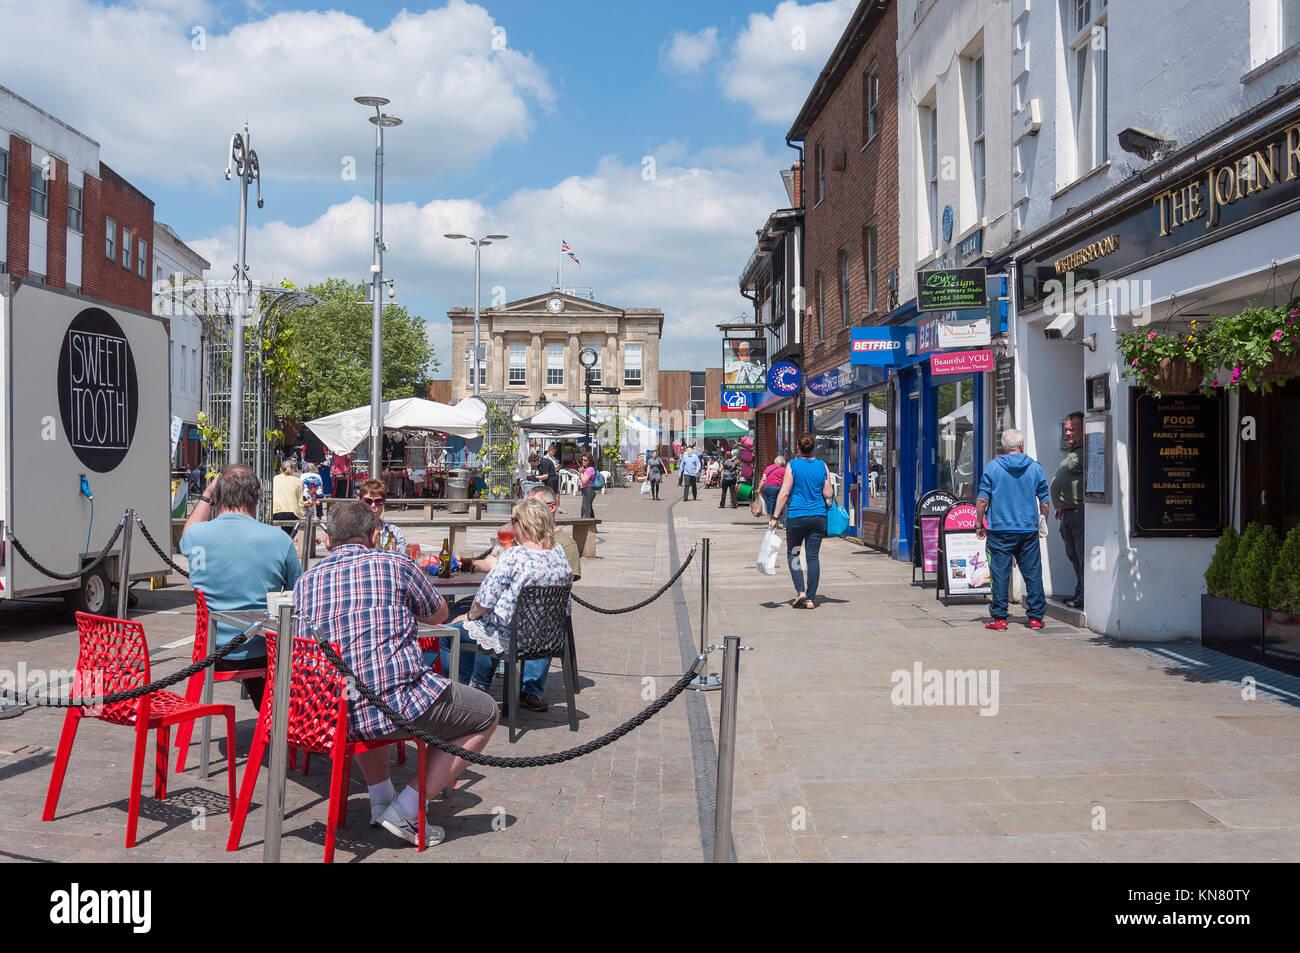 Pedestrianised High Street, Andover, Hampshire, England, United Kingdom - Stock Image